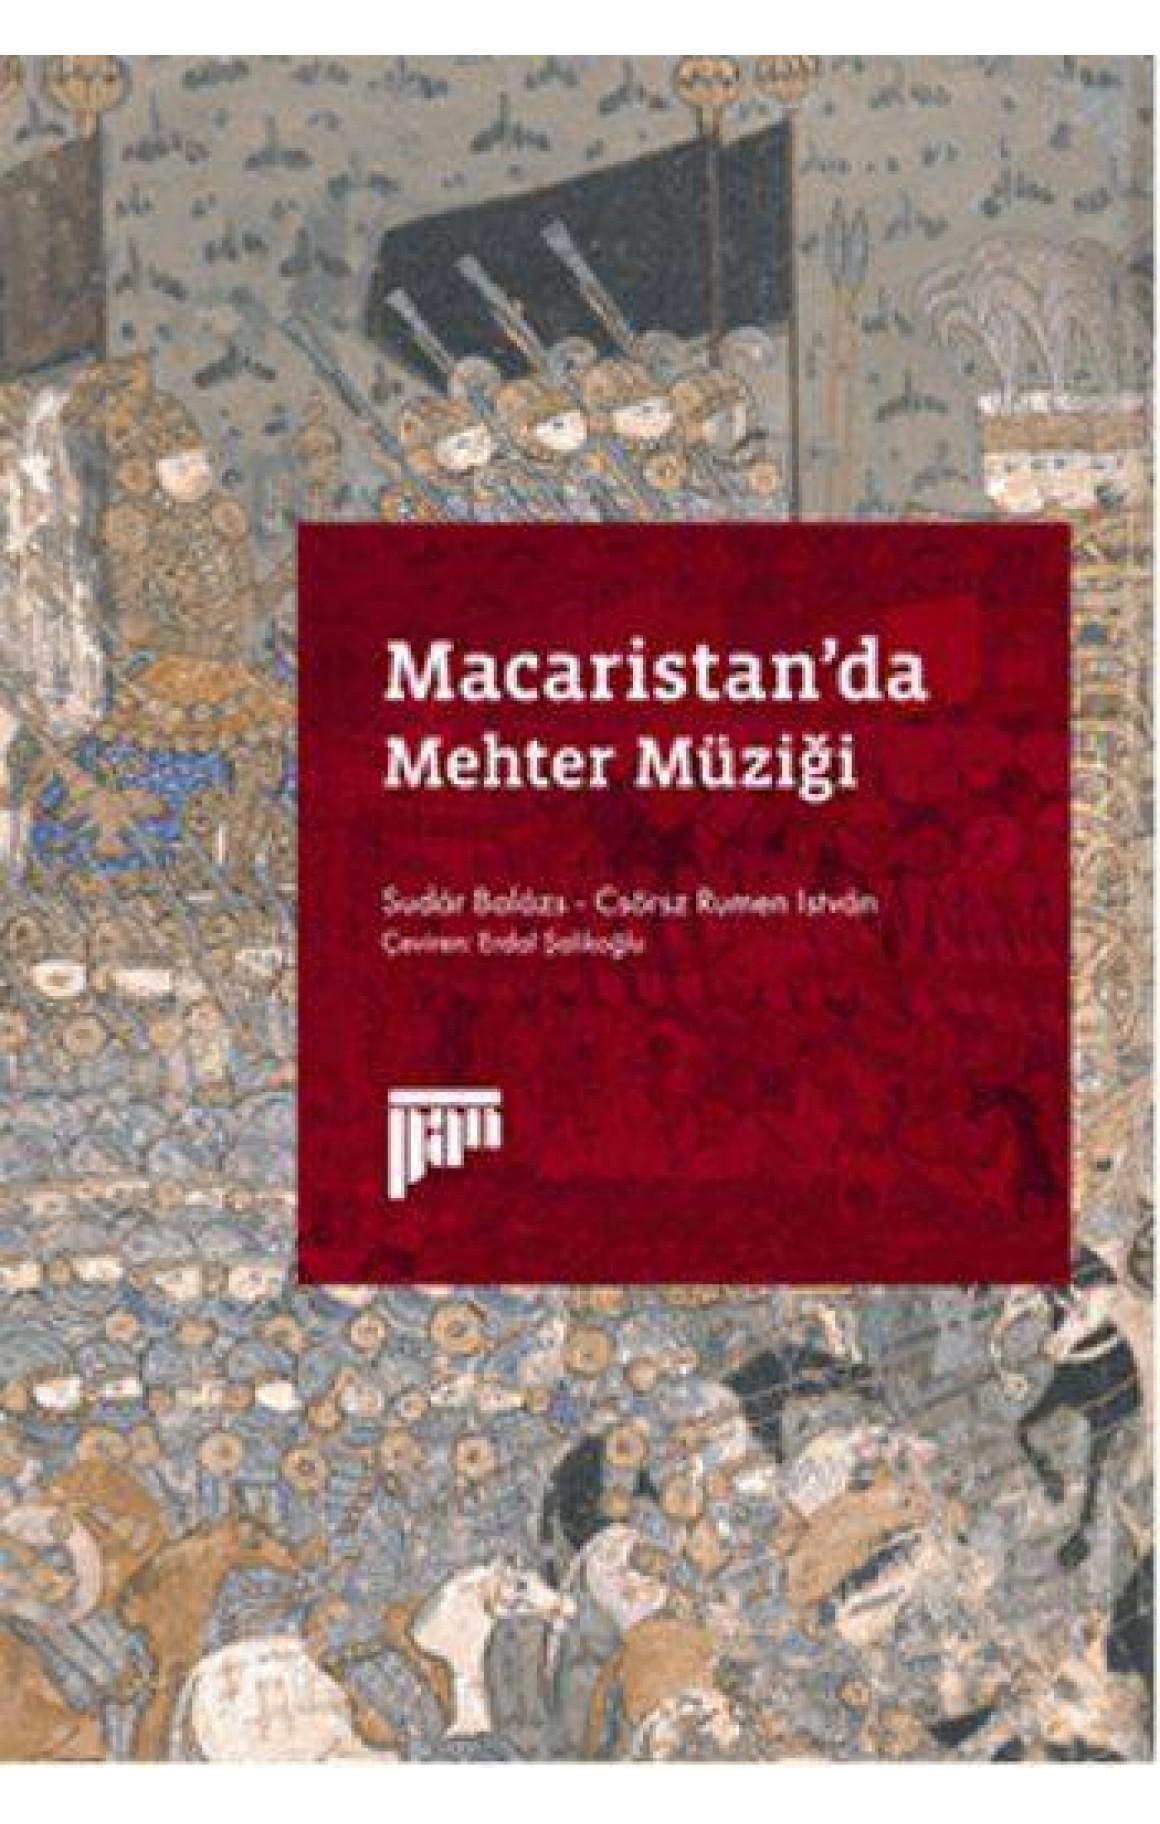 Macaristan'da Mehter Müziği